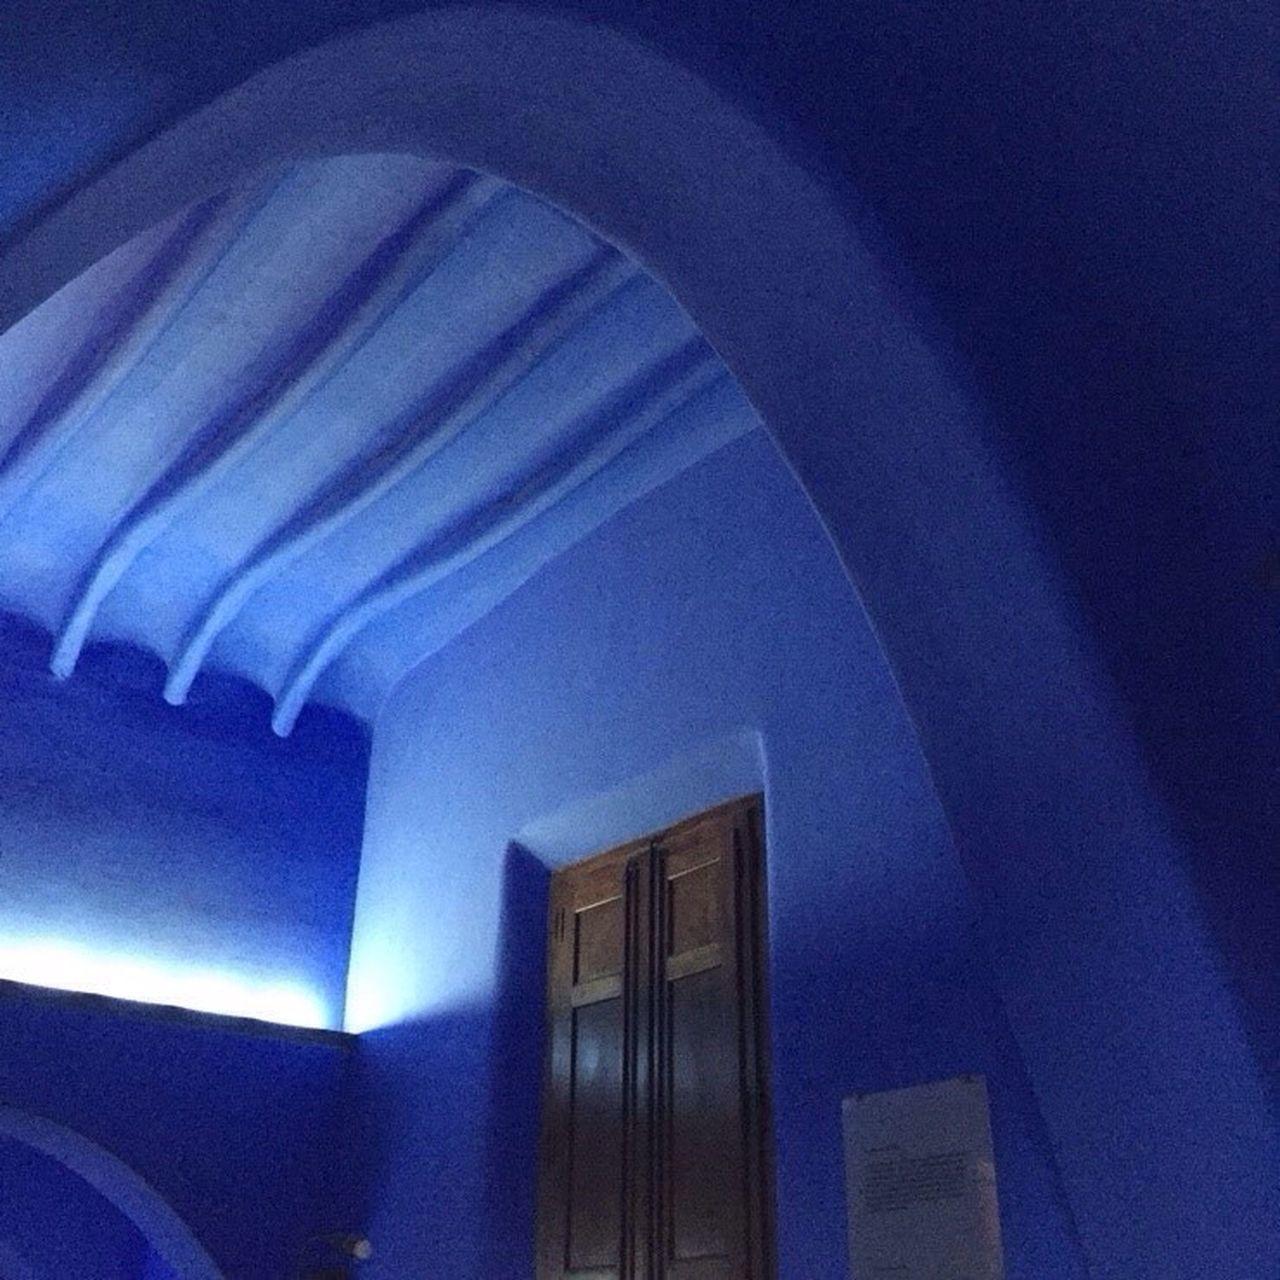 Parcguell Bluewalls Built Structure Architecture